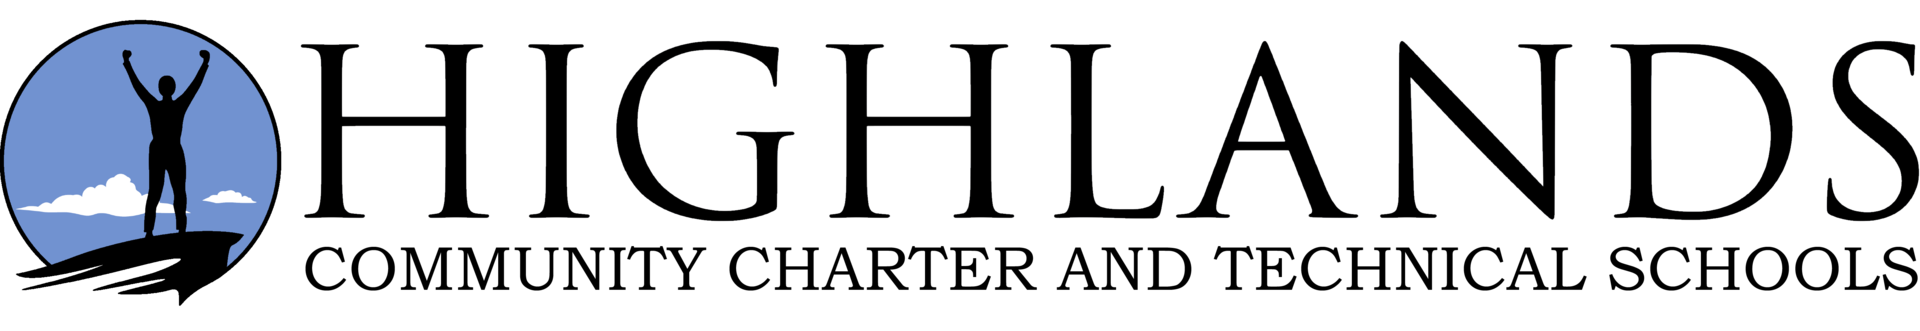 HCCTS Logo